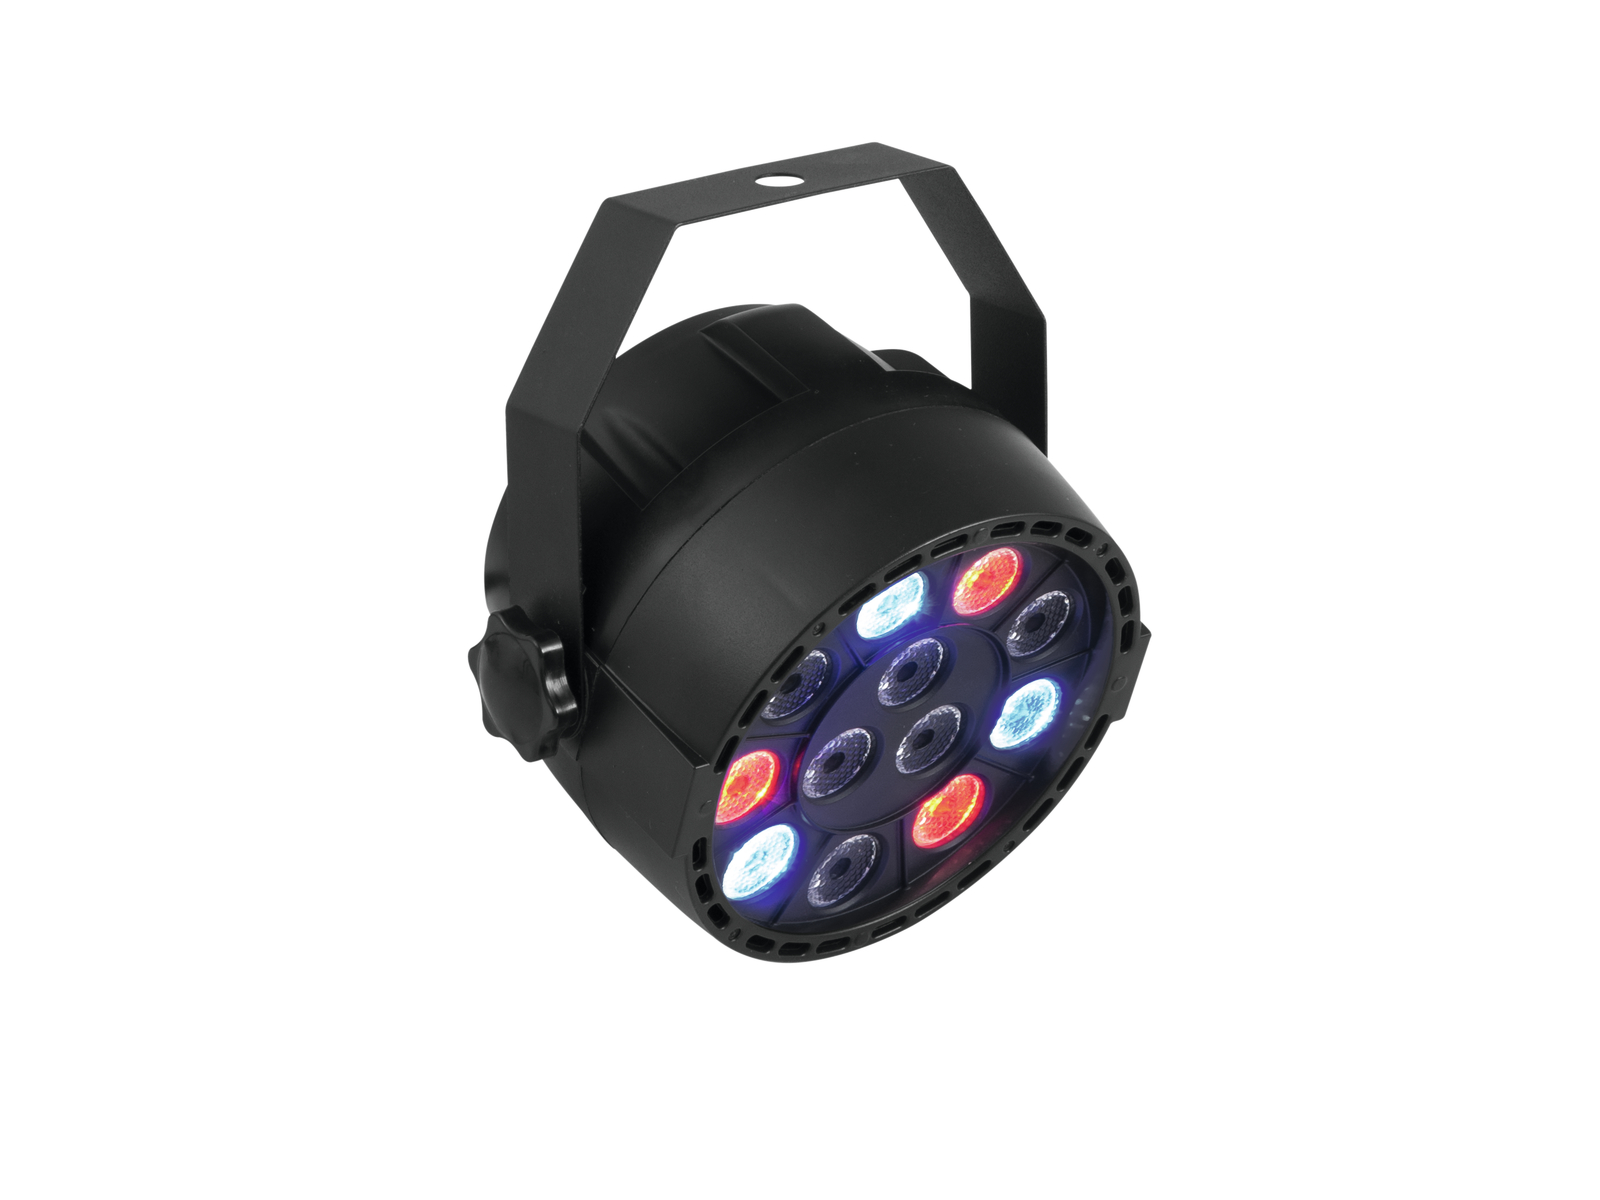 Eurolite LED Party spot 12 x 1W RGBW